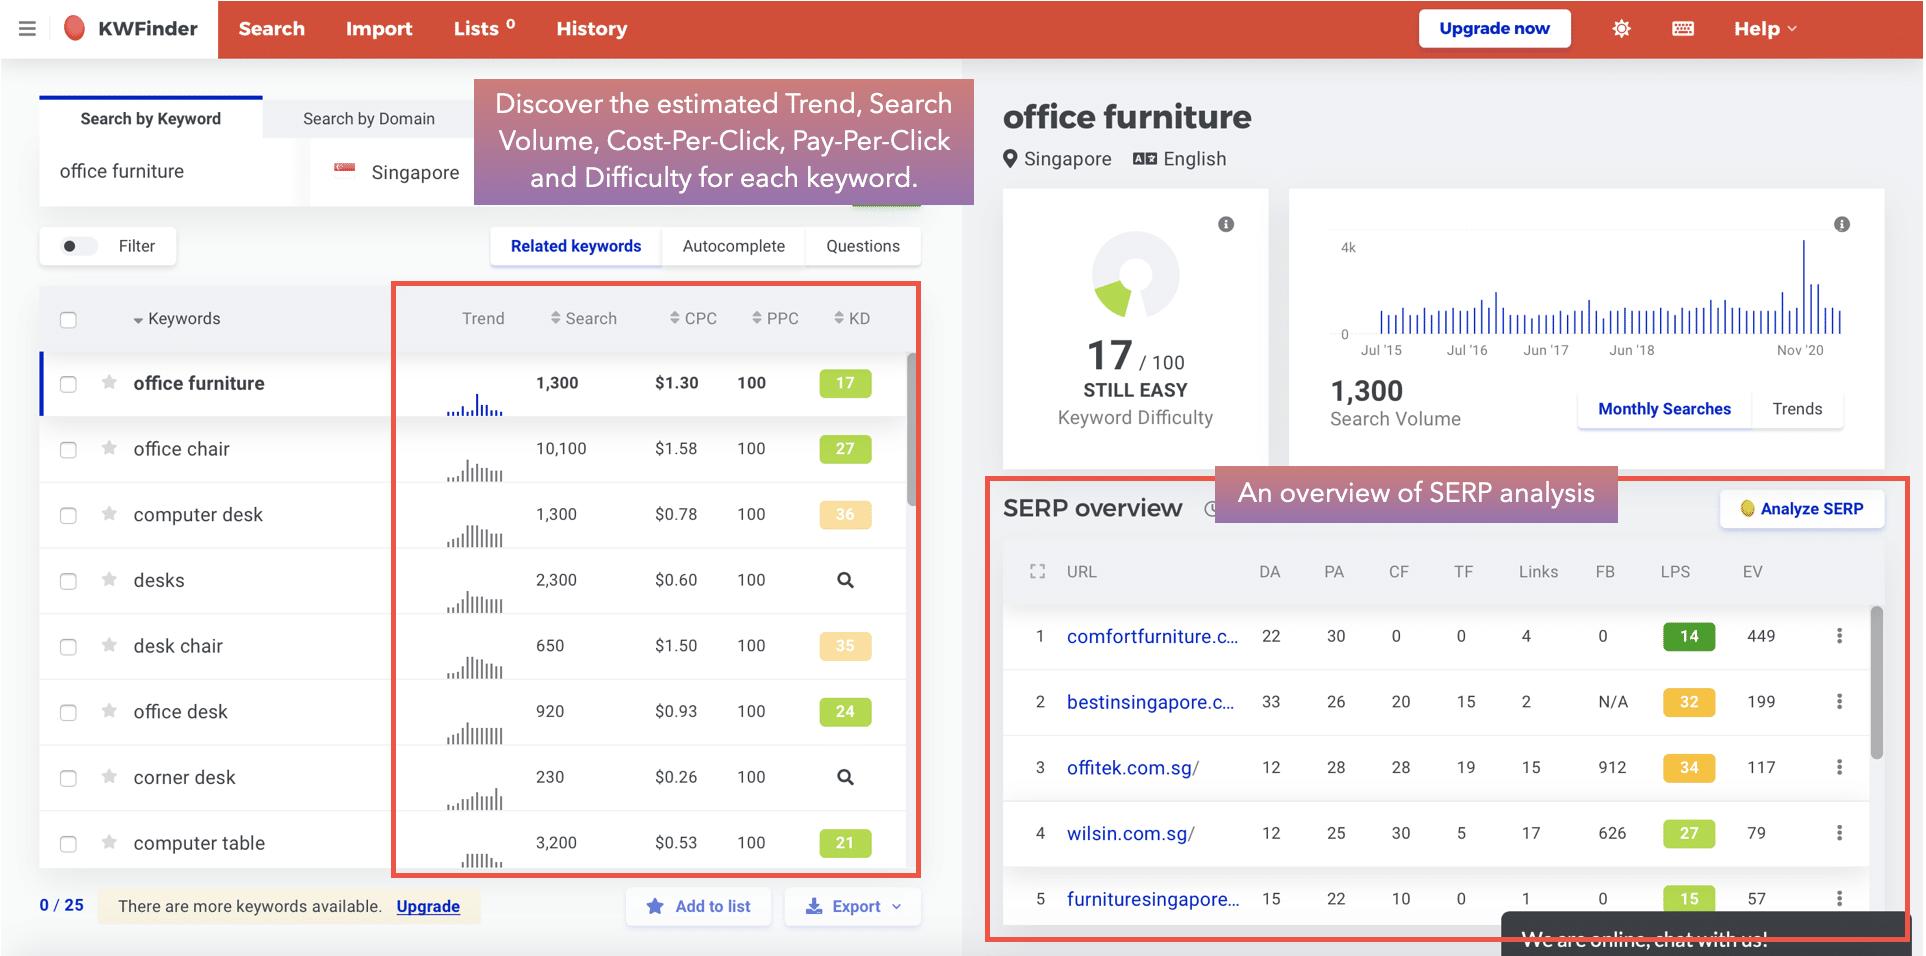 kwfinder result page